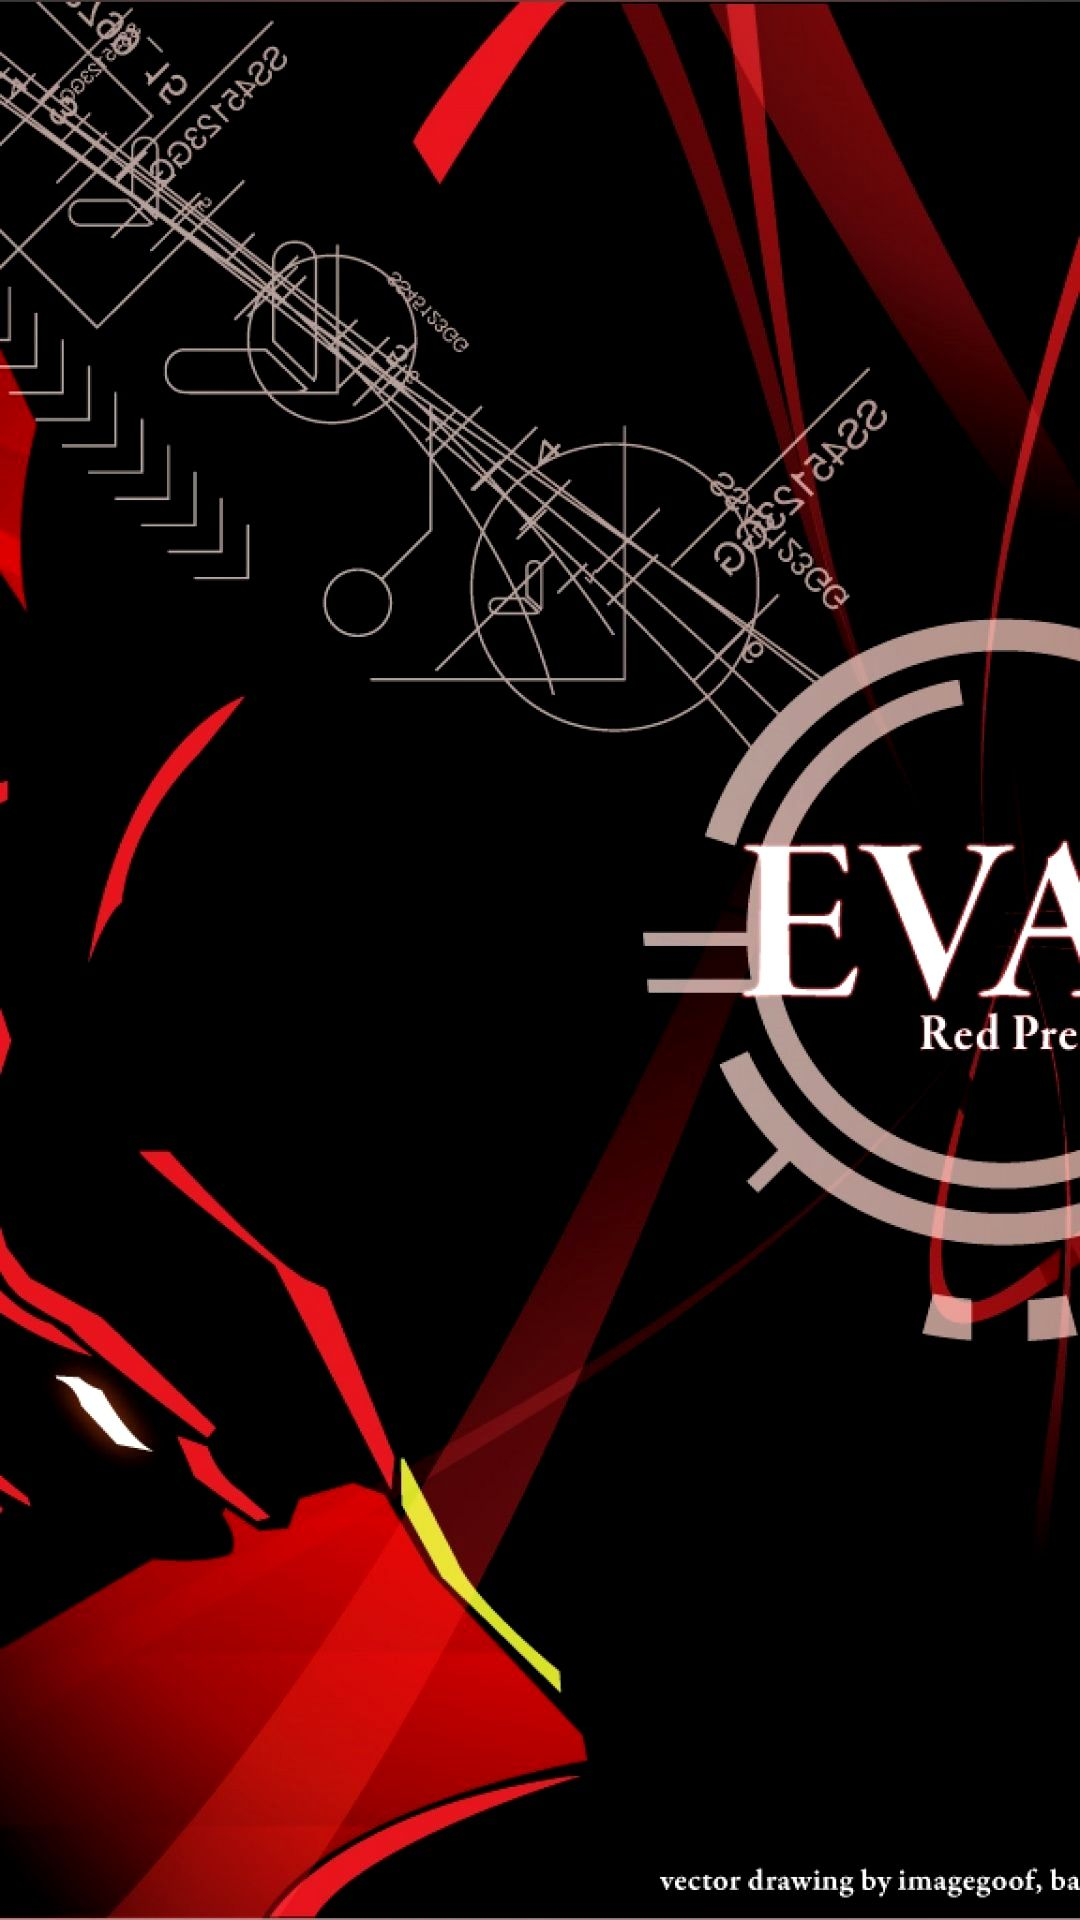 Evangelion Wallpaper Iphone Wallpaper Evangelion Neon Evangelion